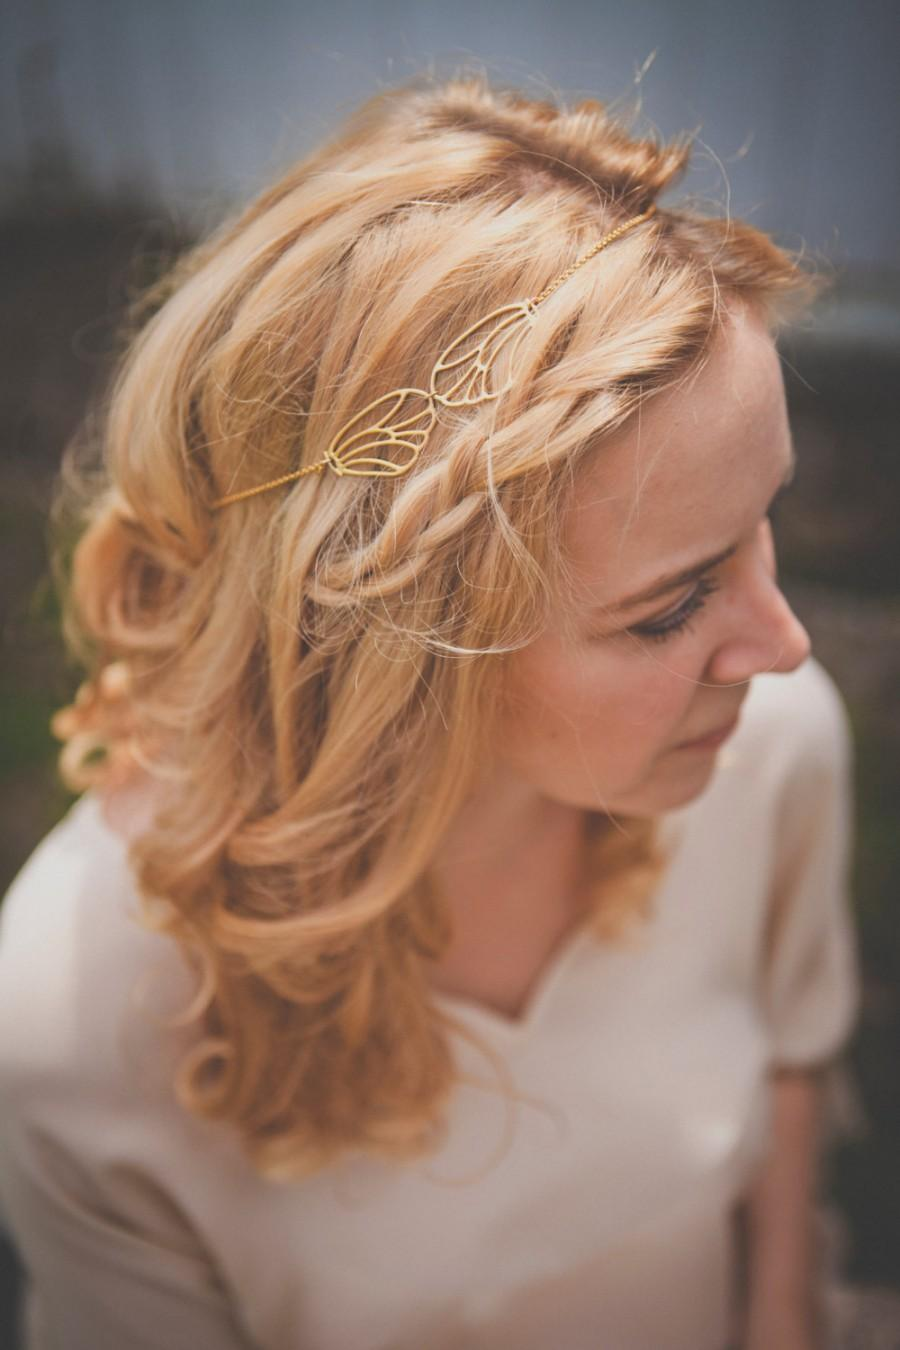 Wedding - Orphee Headpiece - Gold plated 18k hair chain- bridal headband - MADE TO MEASURE  art nouveau 20s 1920s gatsby boho downton abbey woodland